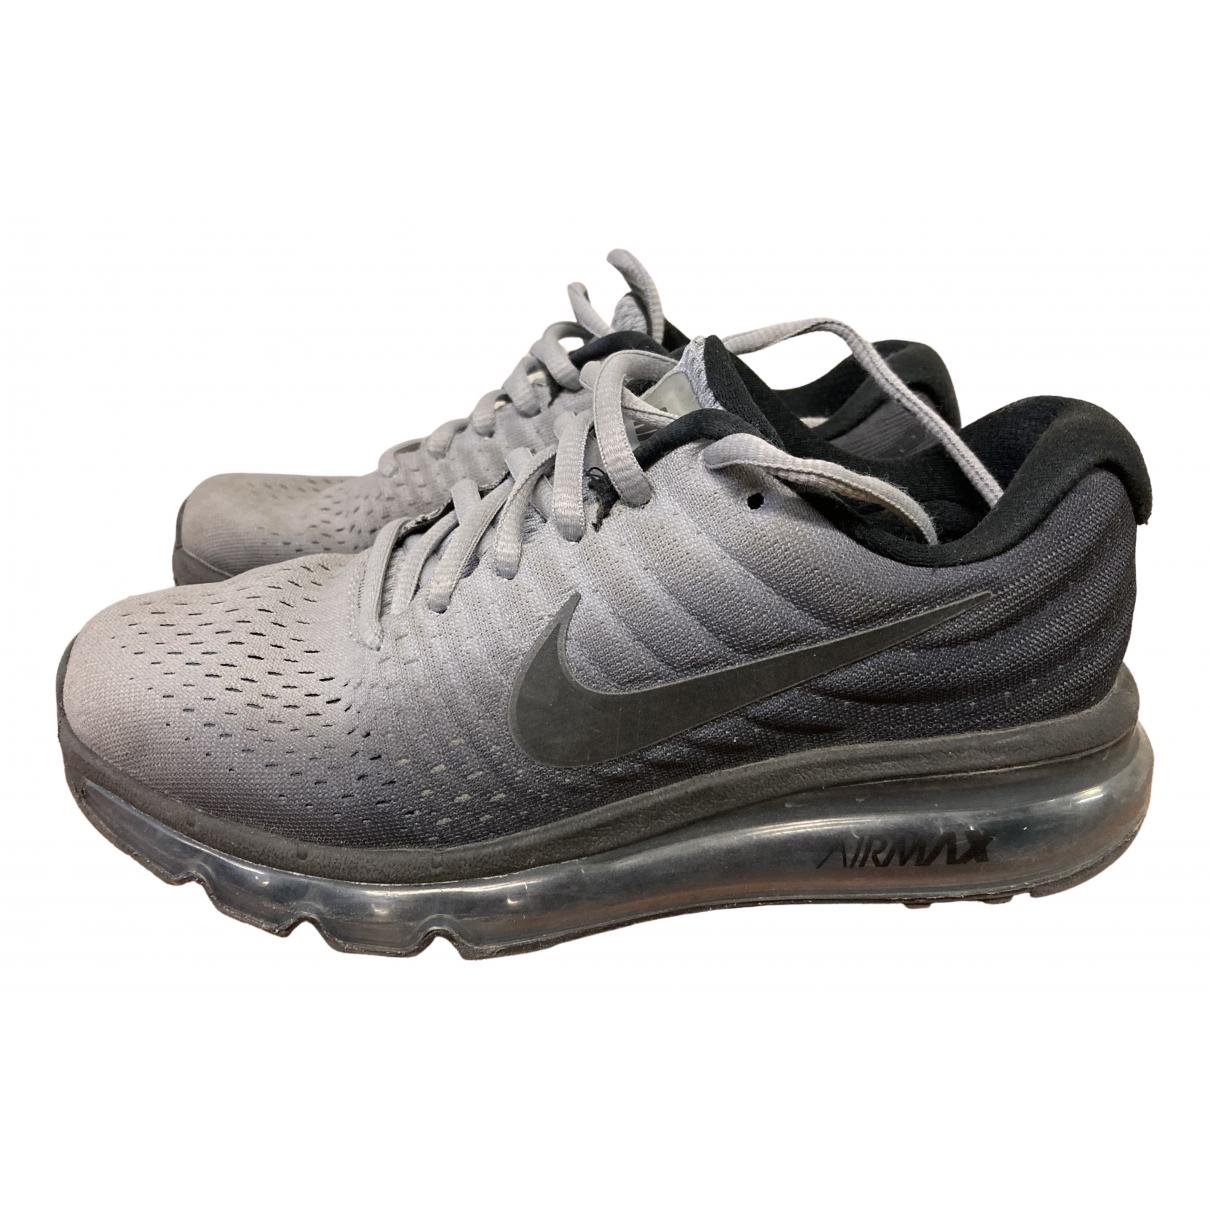 Nike Air Max  Grey Trainers for Women 36.5 EU